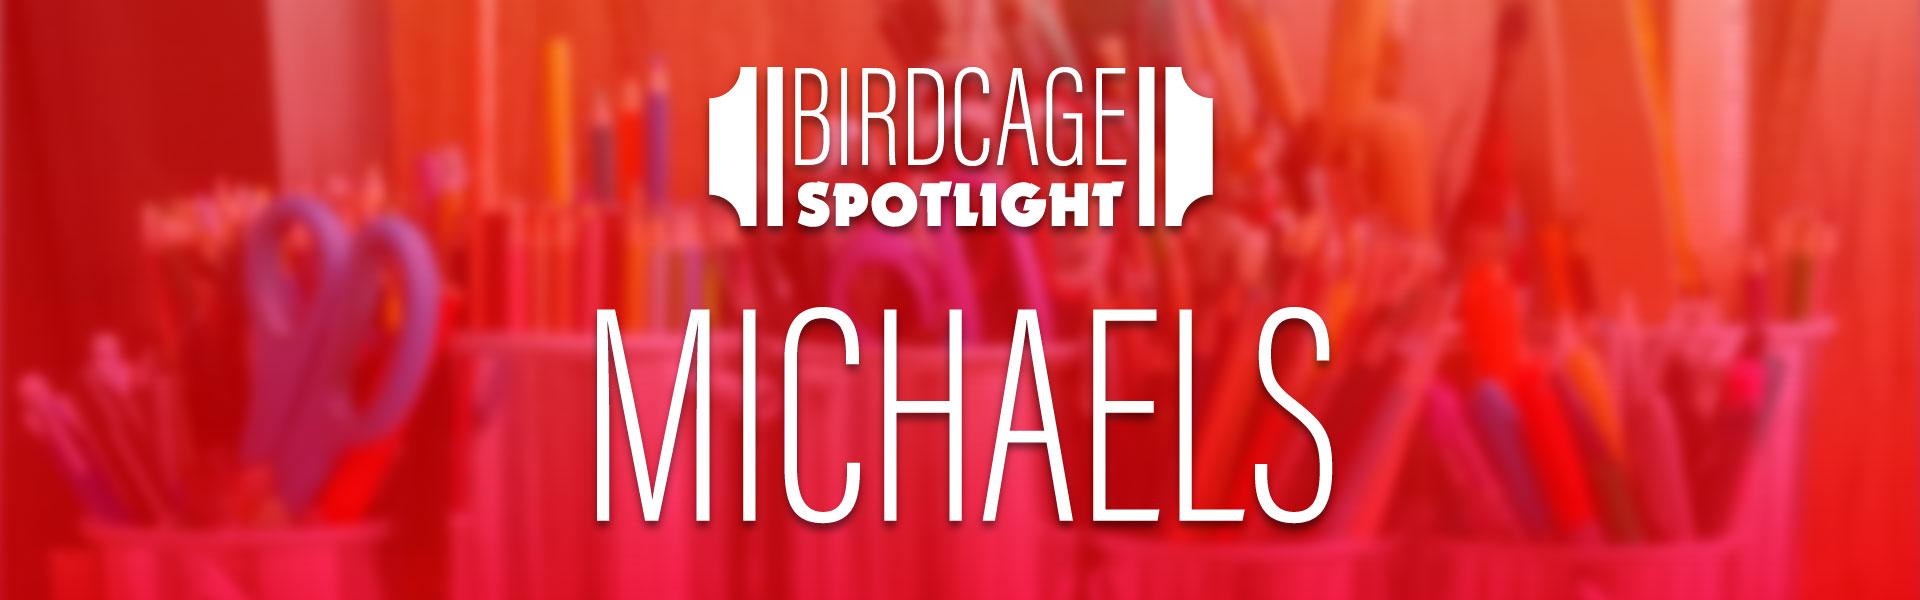 MAB-20-Birdcage-Spotlight-(Michaels)-Ban